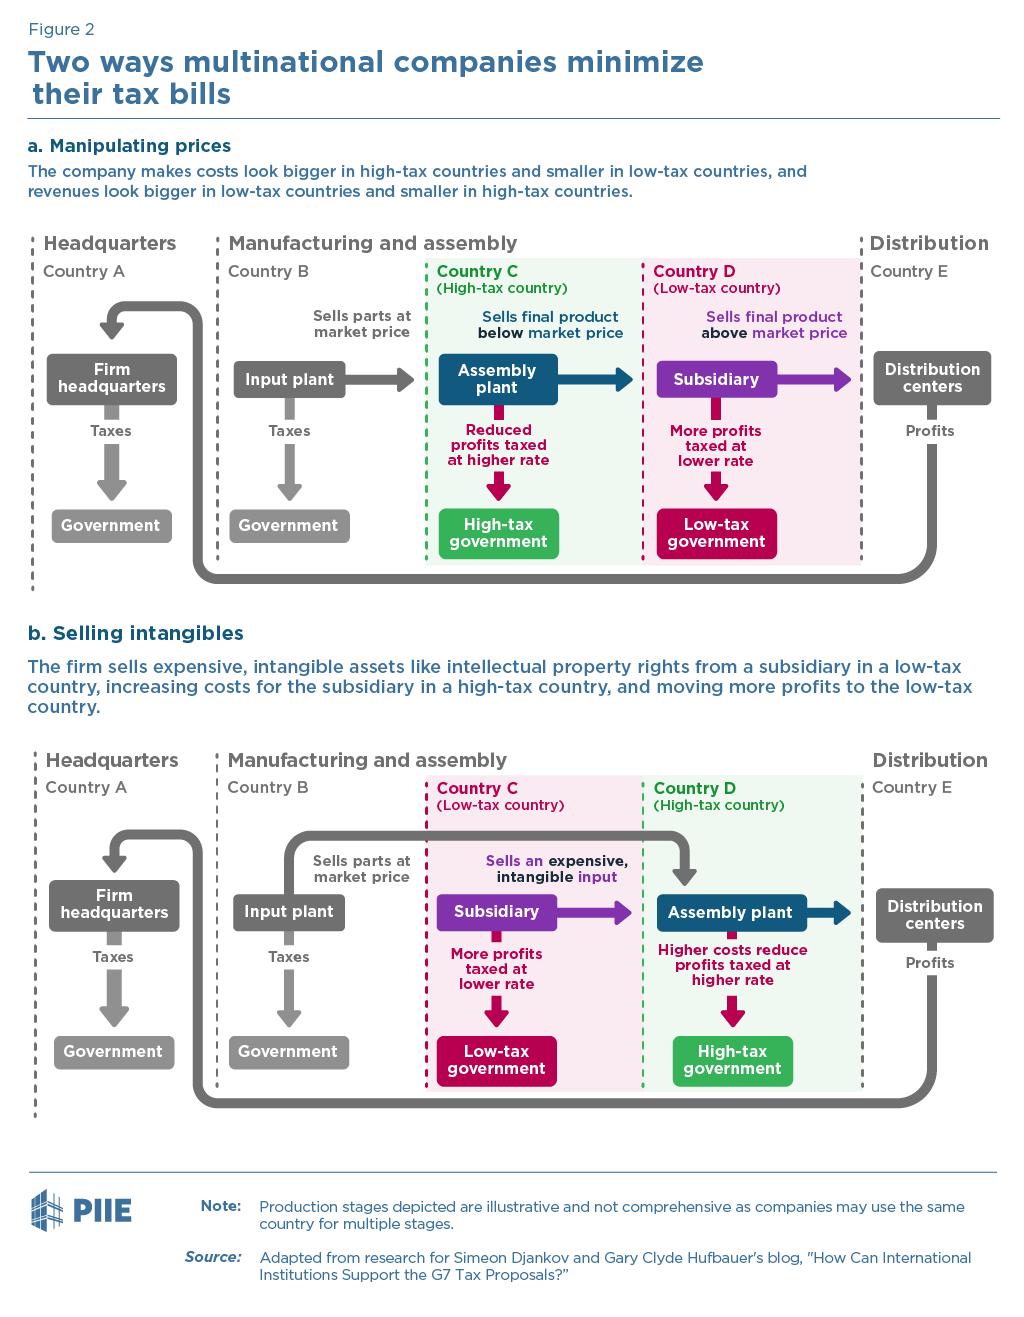 Figure 2 Two ways multinational companies minimize their tax bills